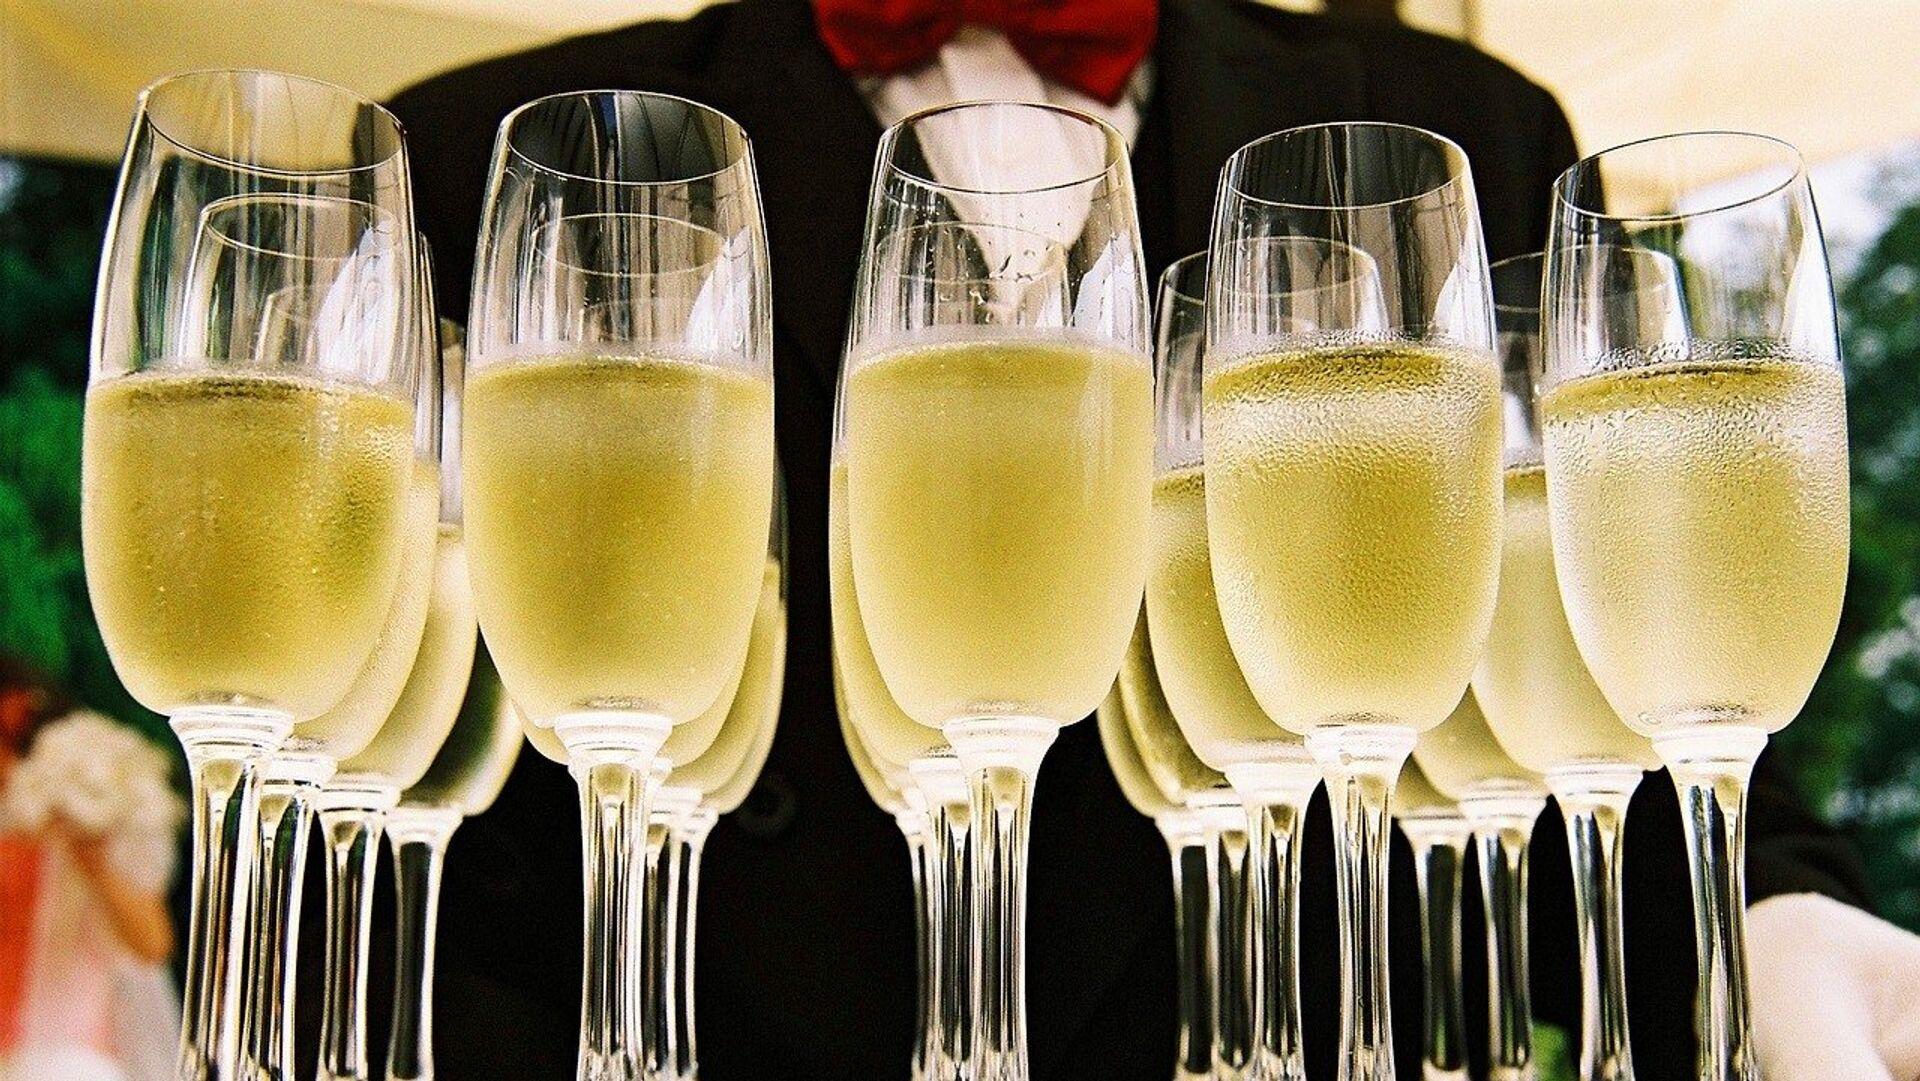 Champagne - Sputnik International, 1920, 19.09.2021